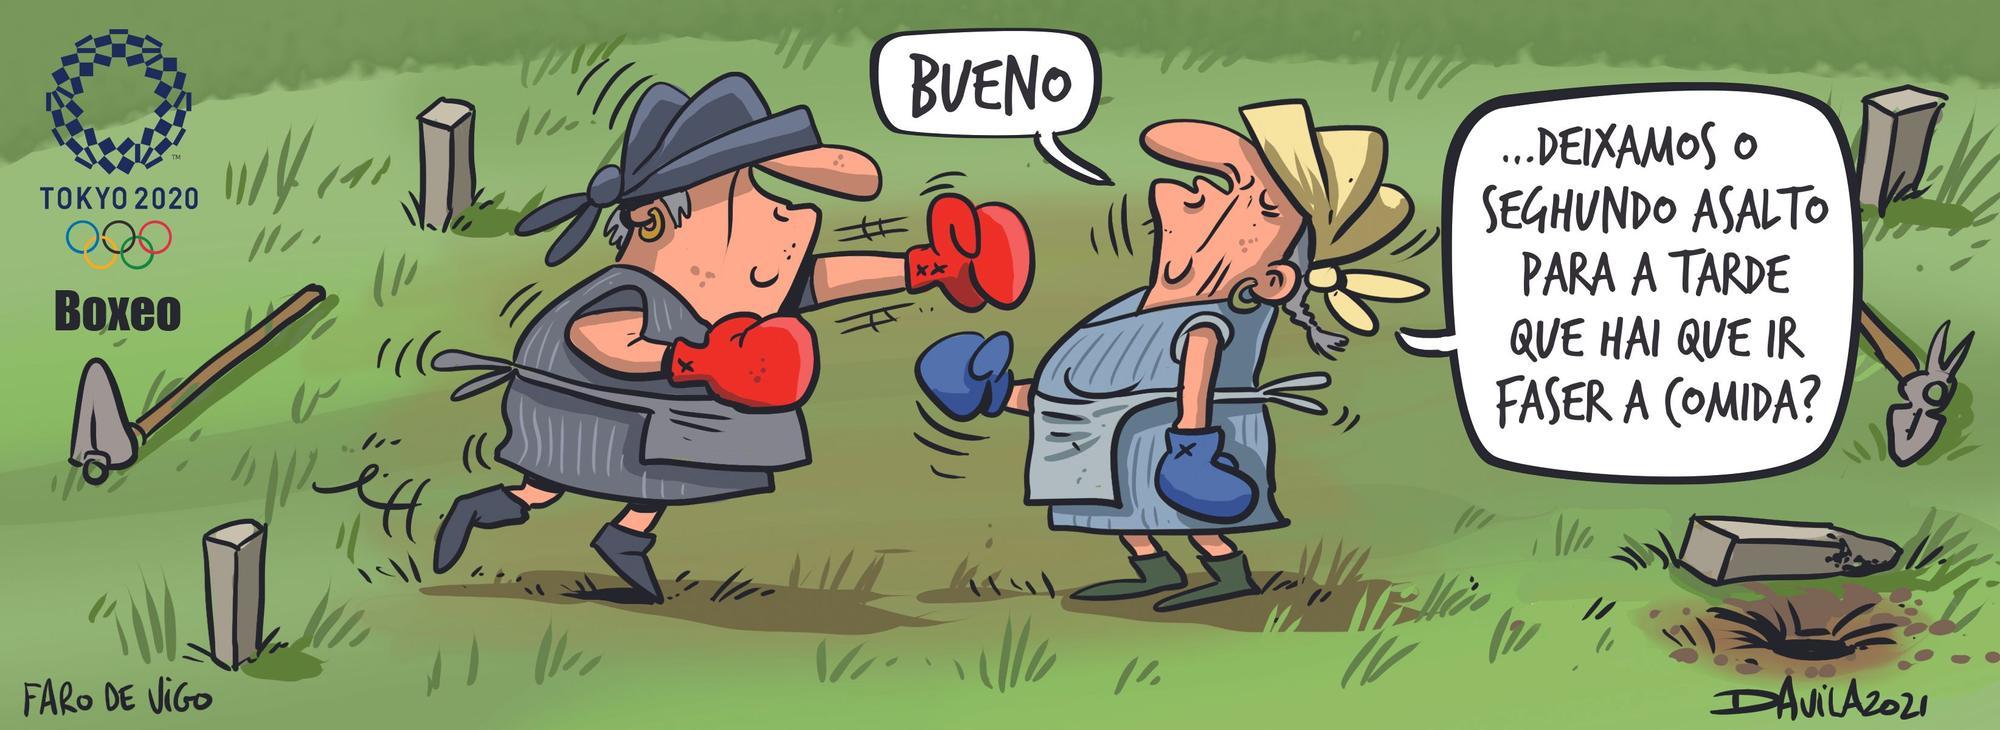 Boxeo.jpg